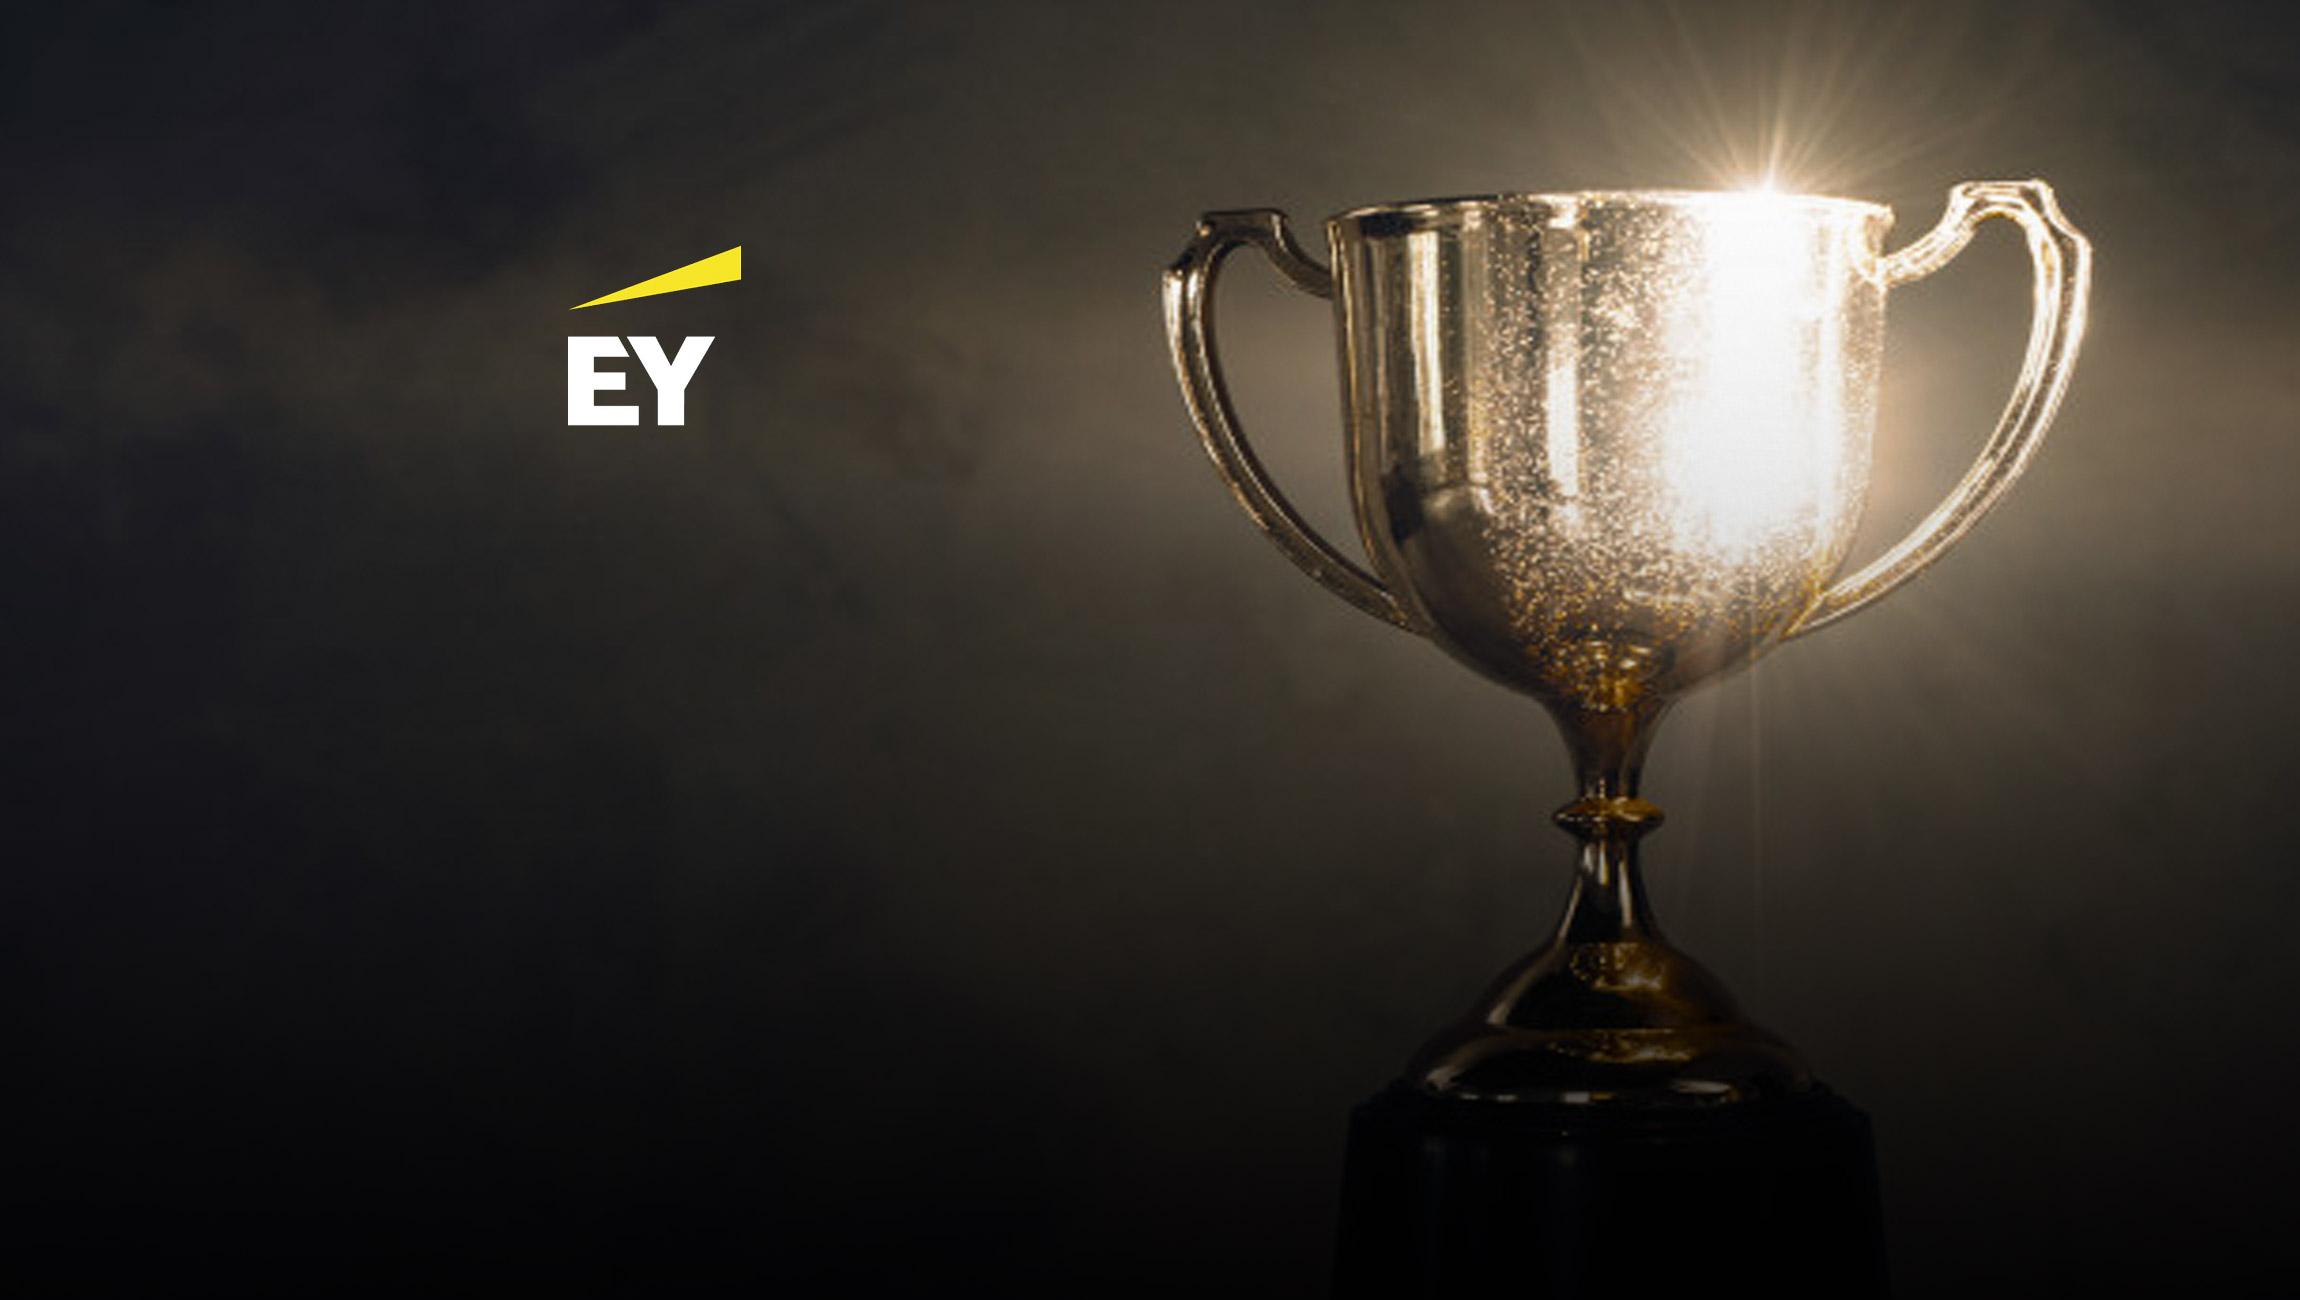 EY Announces Raavi Iqbal of SocialLadder as an Entrepreneur Of The Year® 2020 Greater Philadelphia Award Finalist